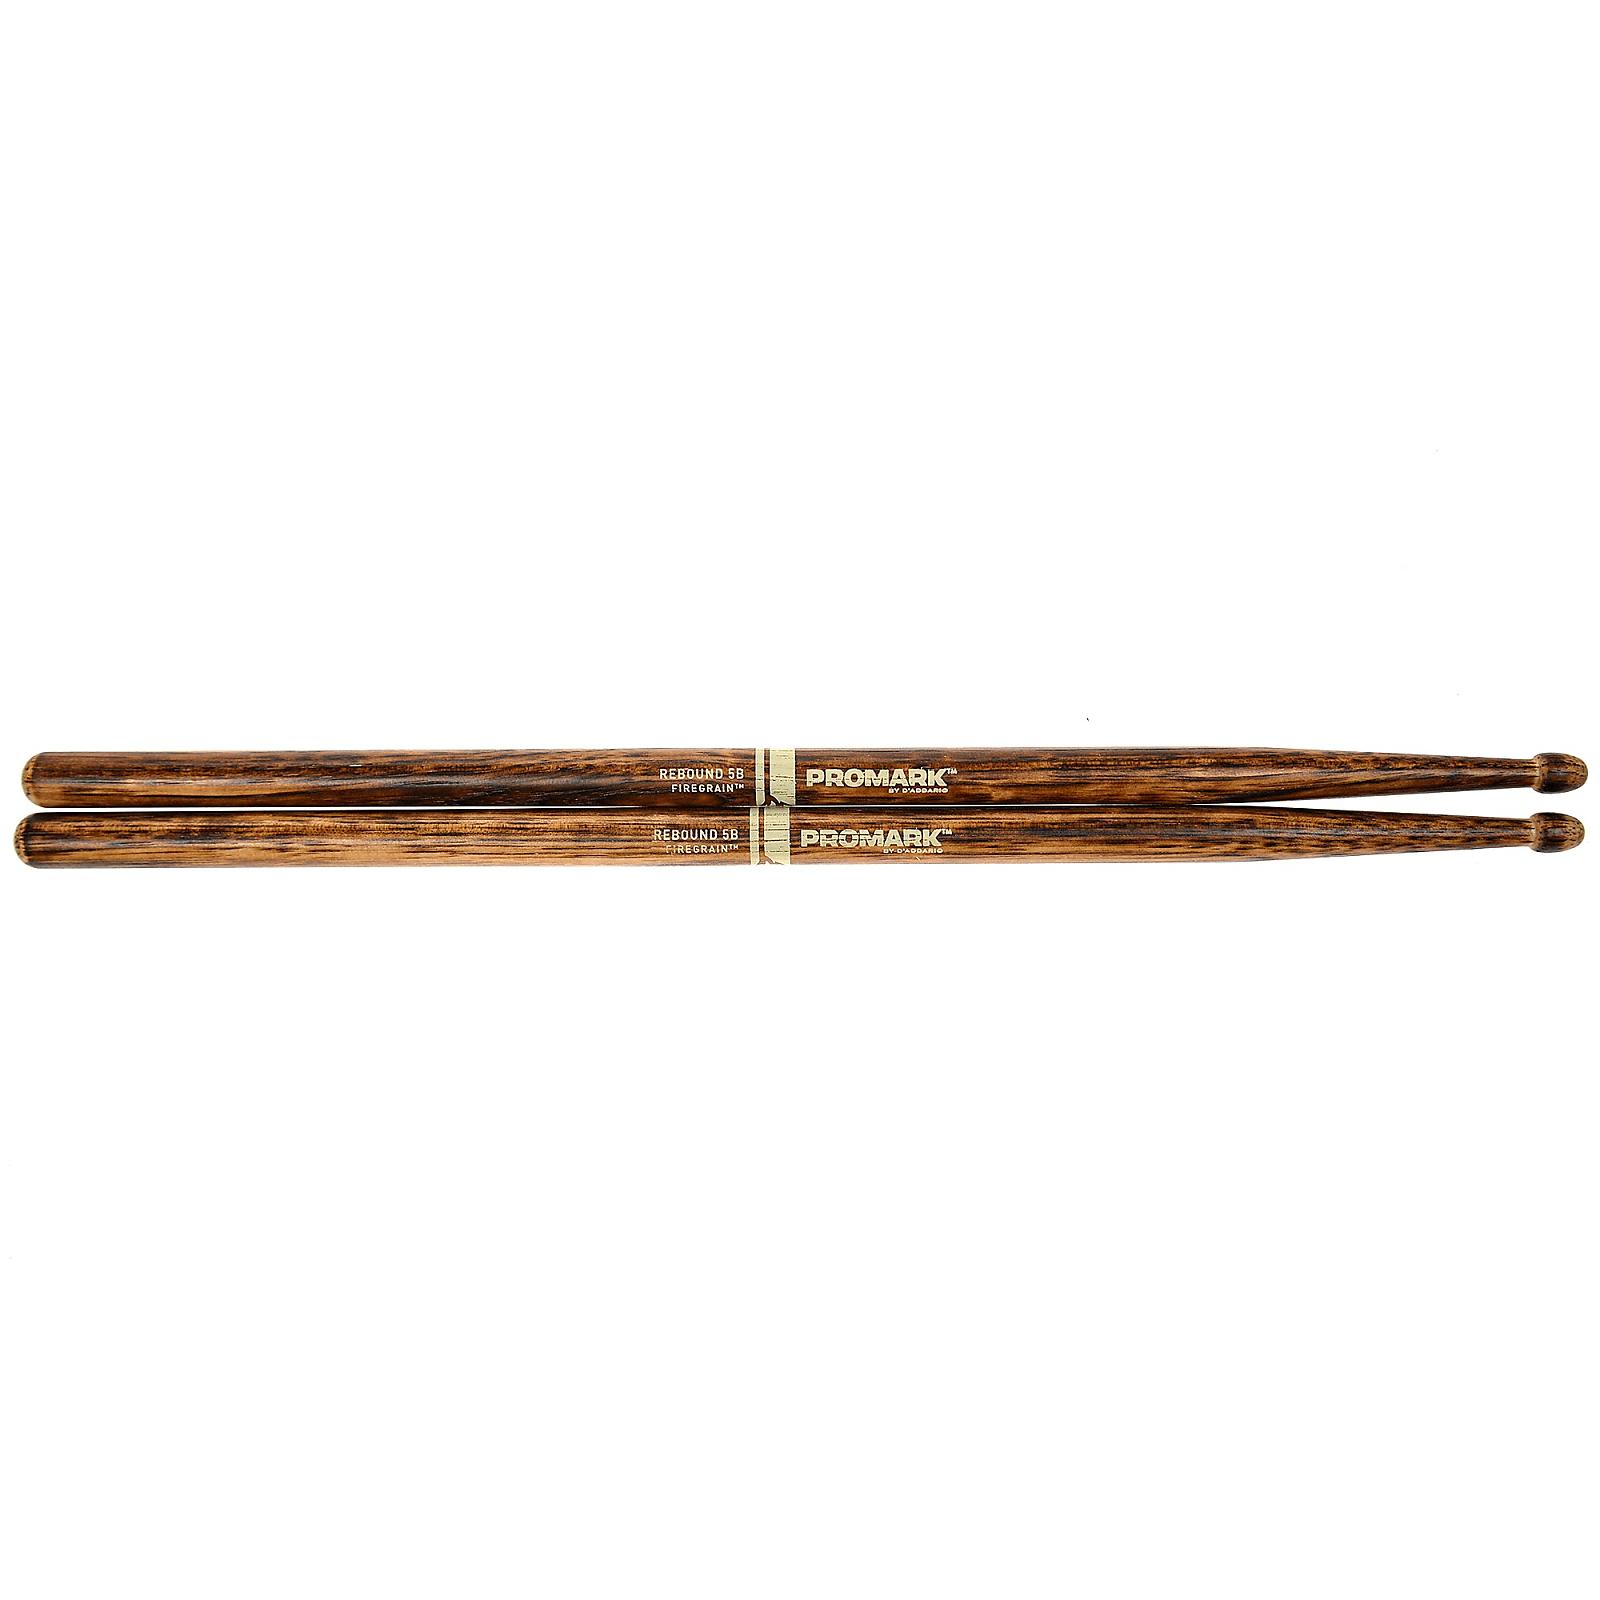 Promark American Hickory Forward 5B Firegrain Drum Sticks